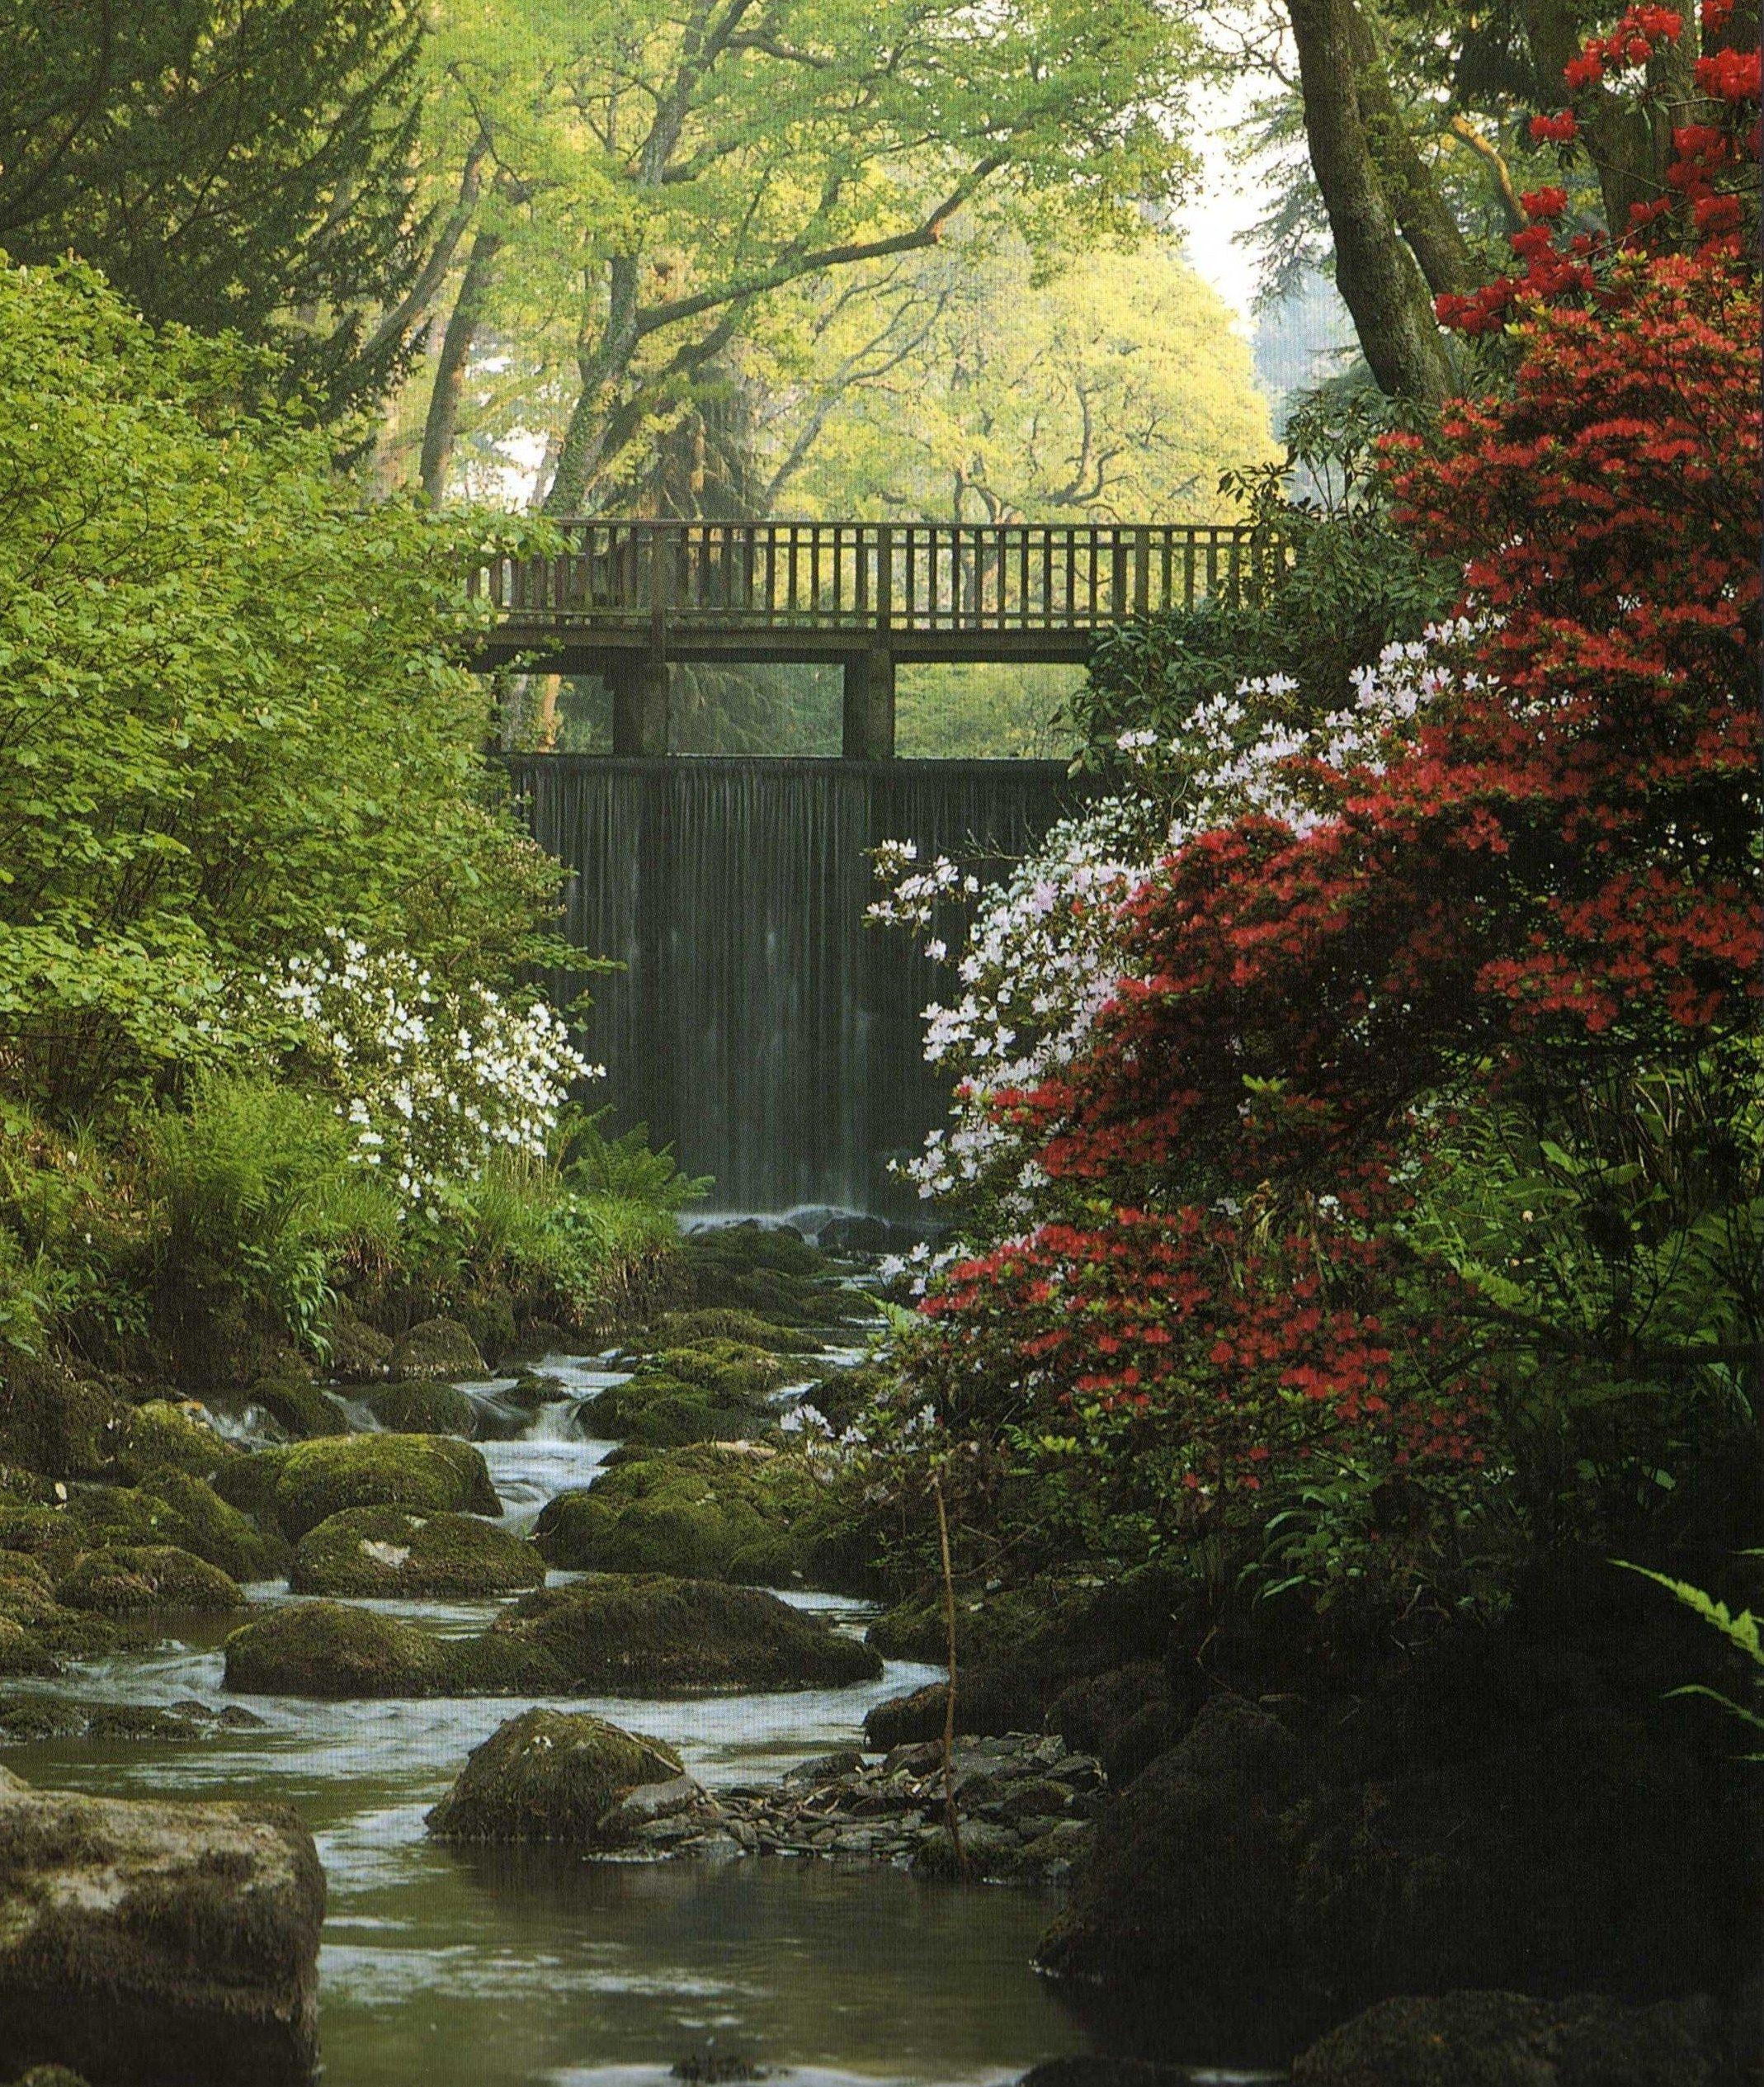 5b137afa9732e94a8052d9279f8c1de6 - Places To Stay Near Bodnant Gardens